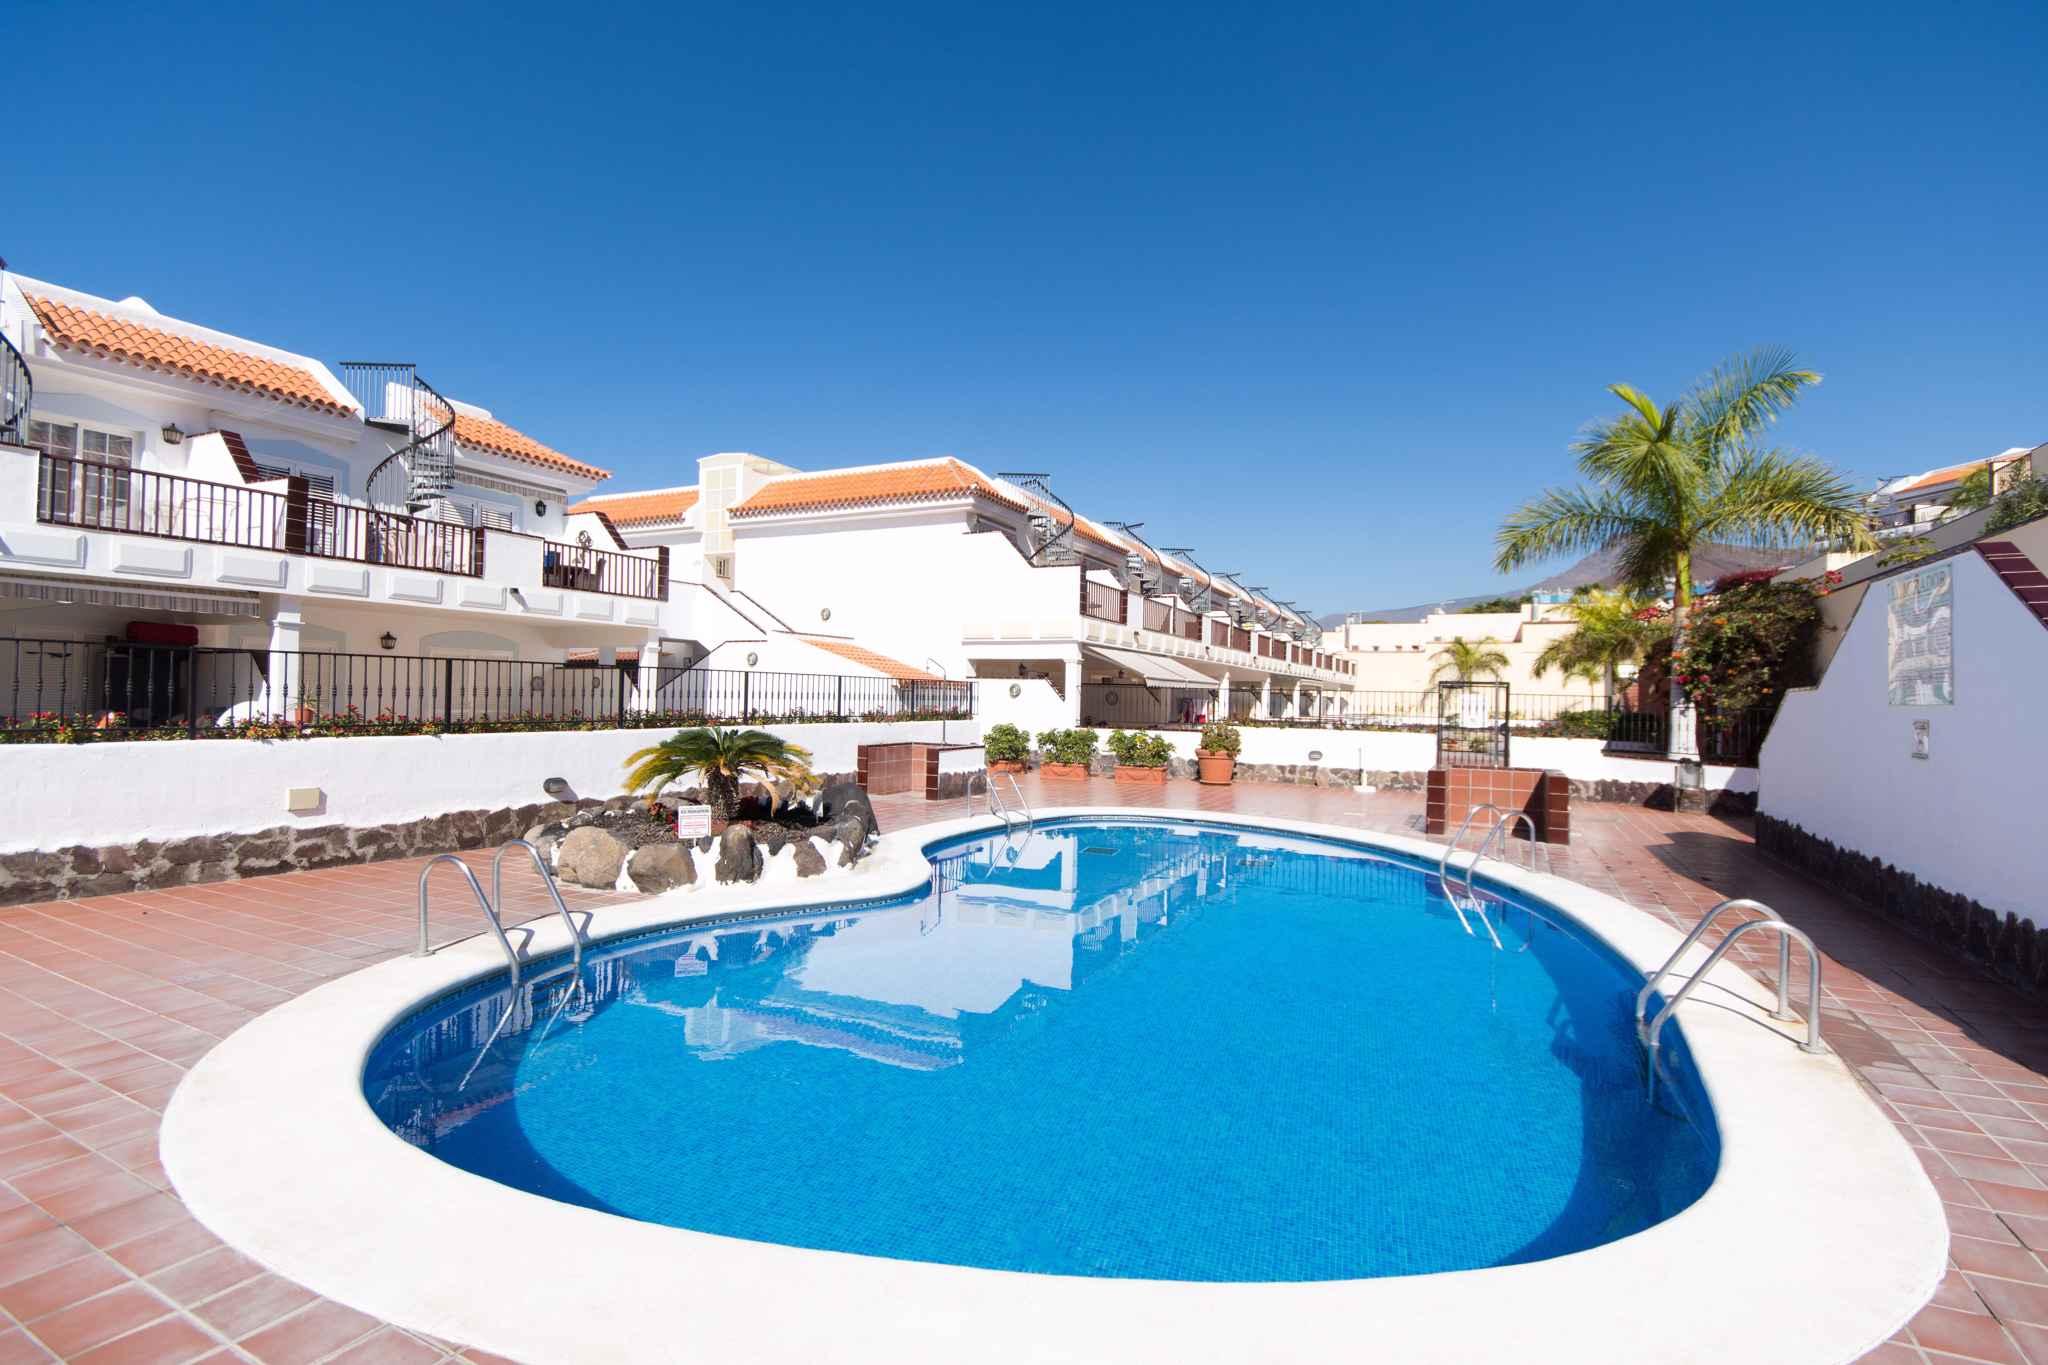 Holiday apartment mit Pool zur gemeinsamen Nutzung (2382910), Los Cristianos, Tenerife, Canary Islands, Spain, picture 5